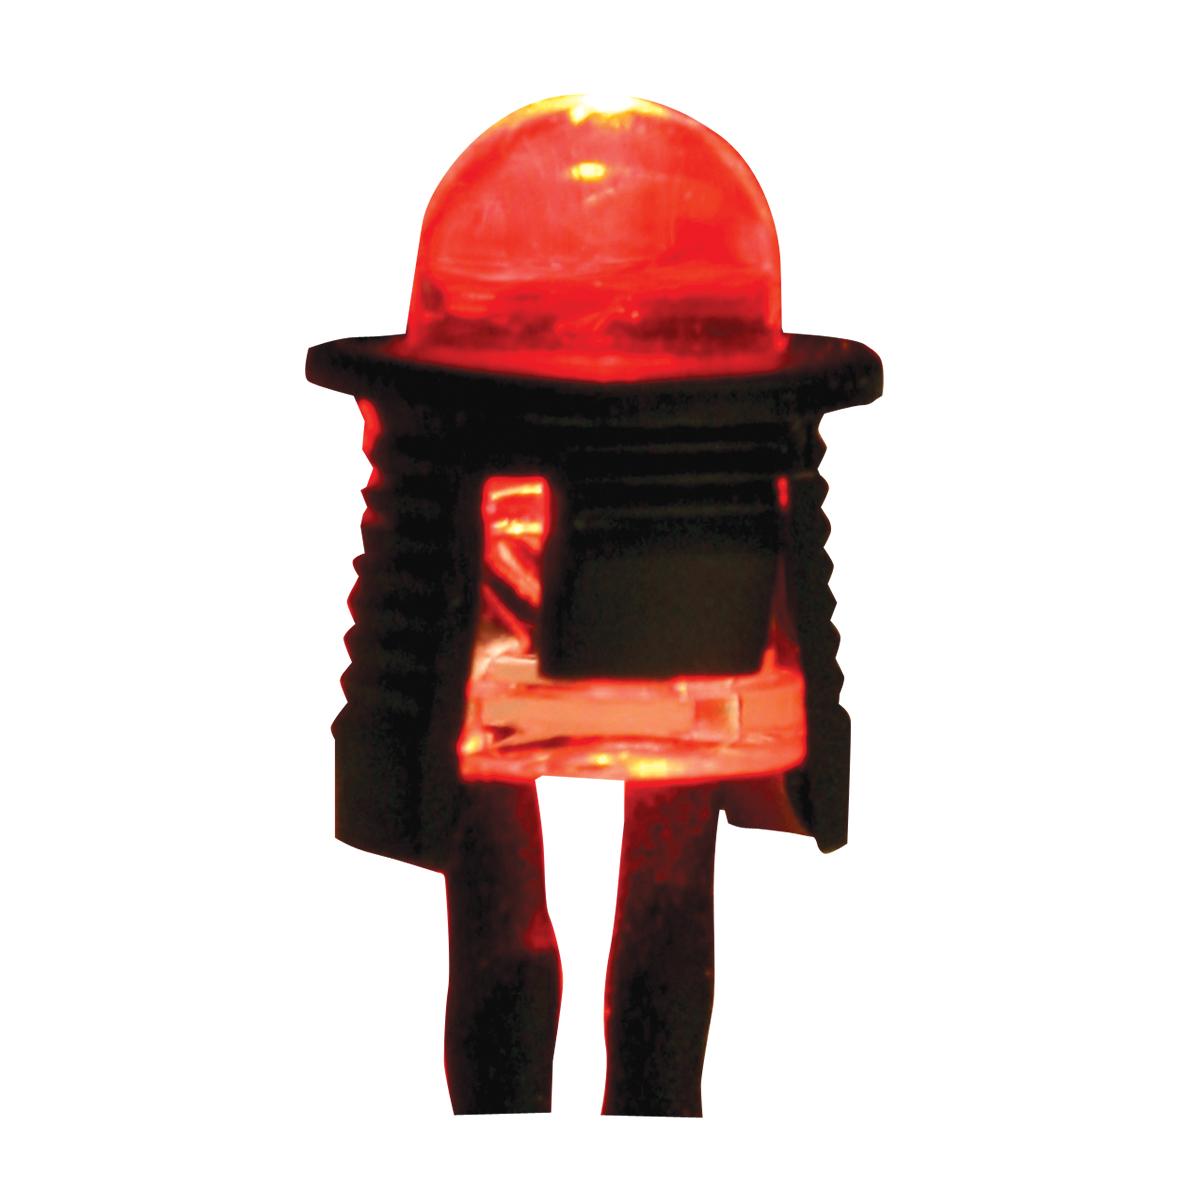 Single Red LED Light Bulb – Profile View